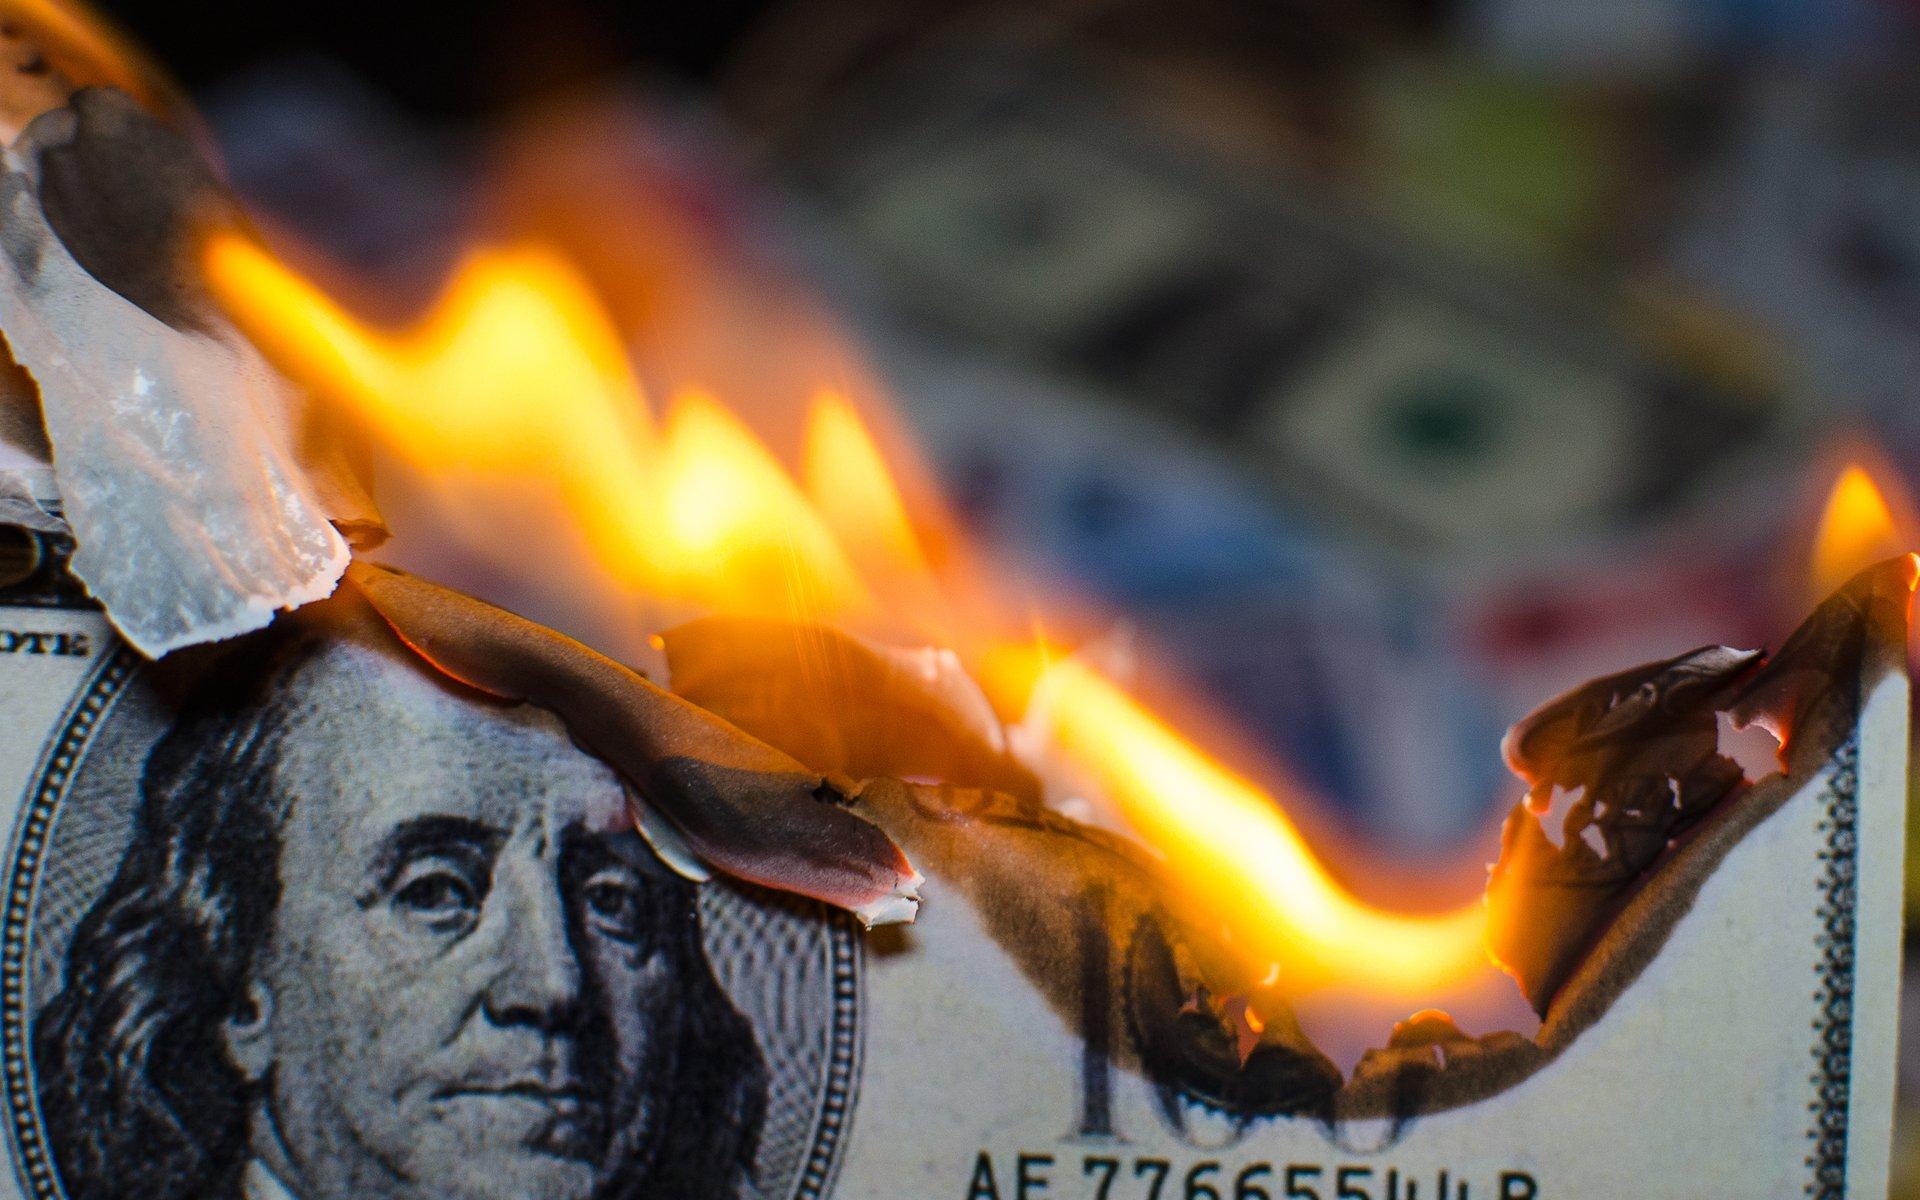 Cashless war on cash